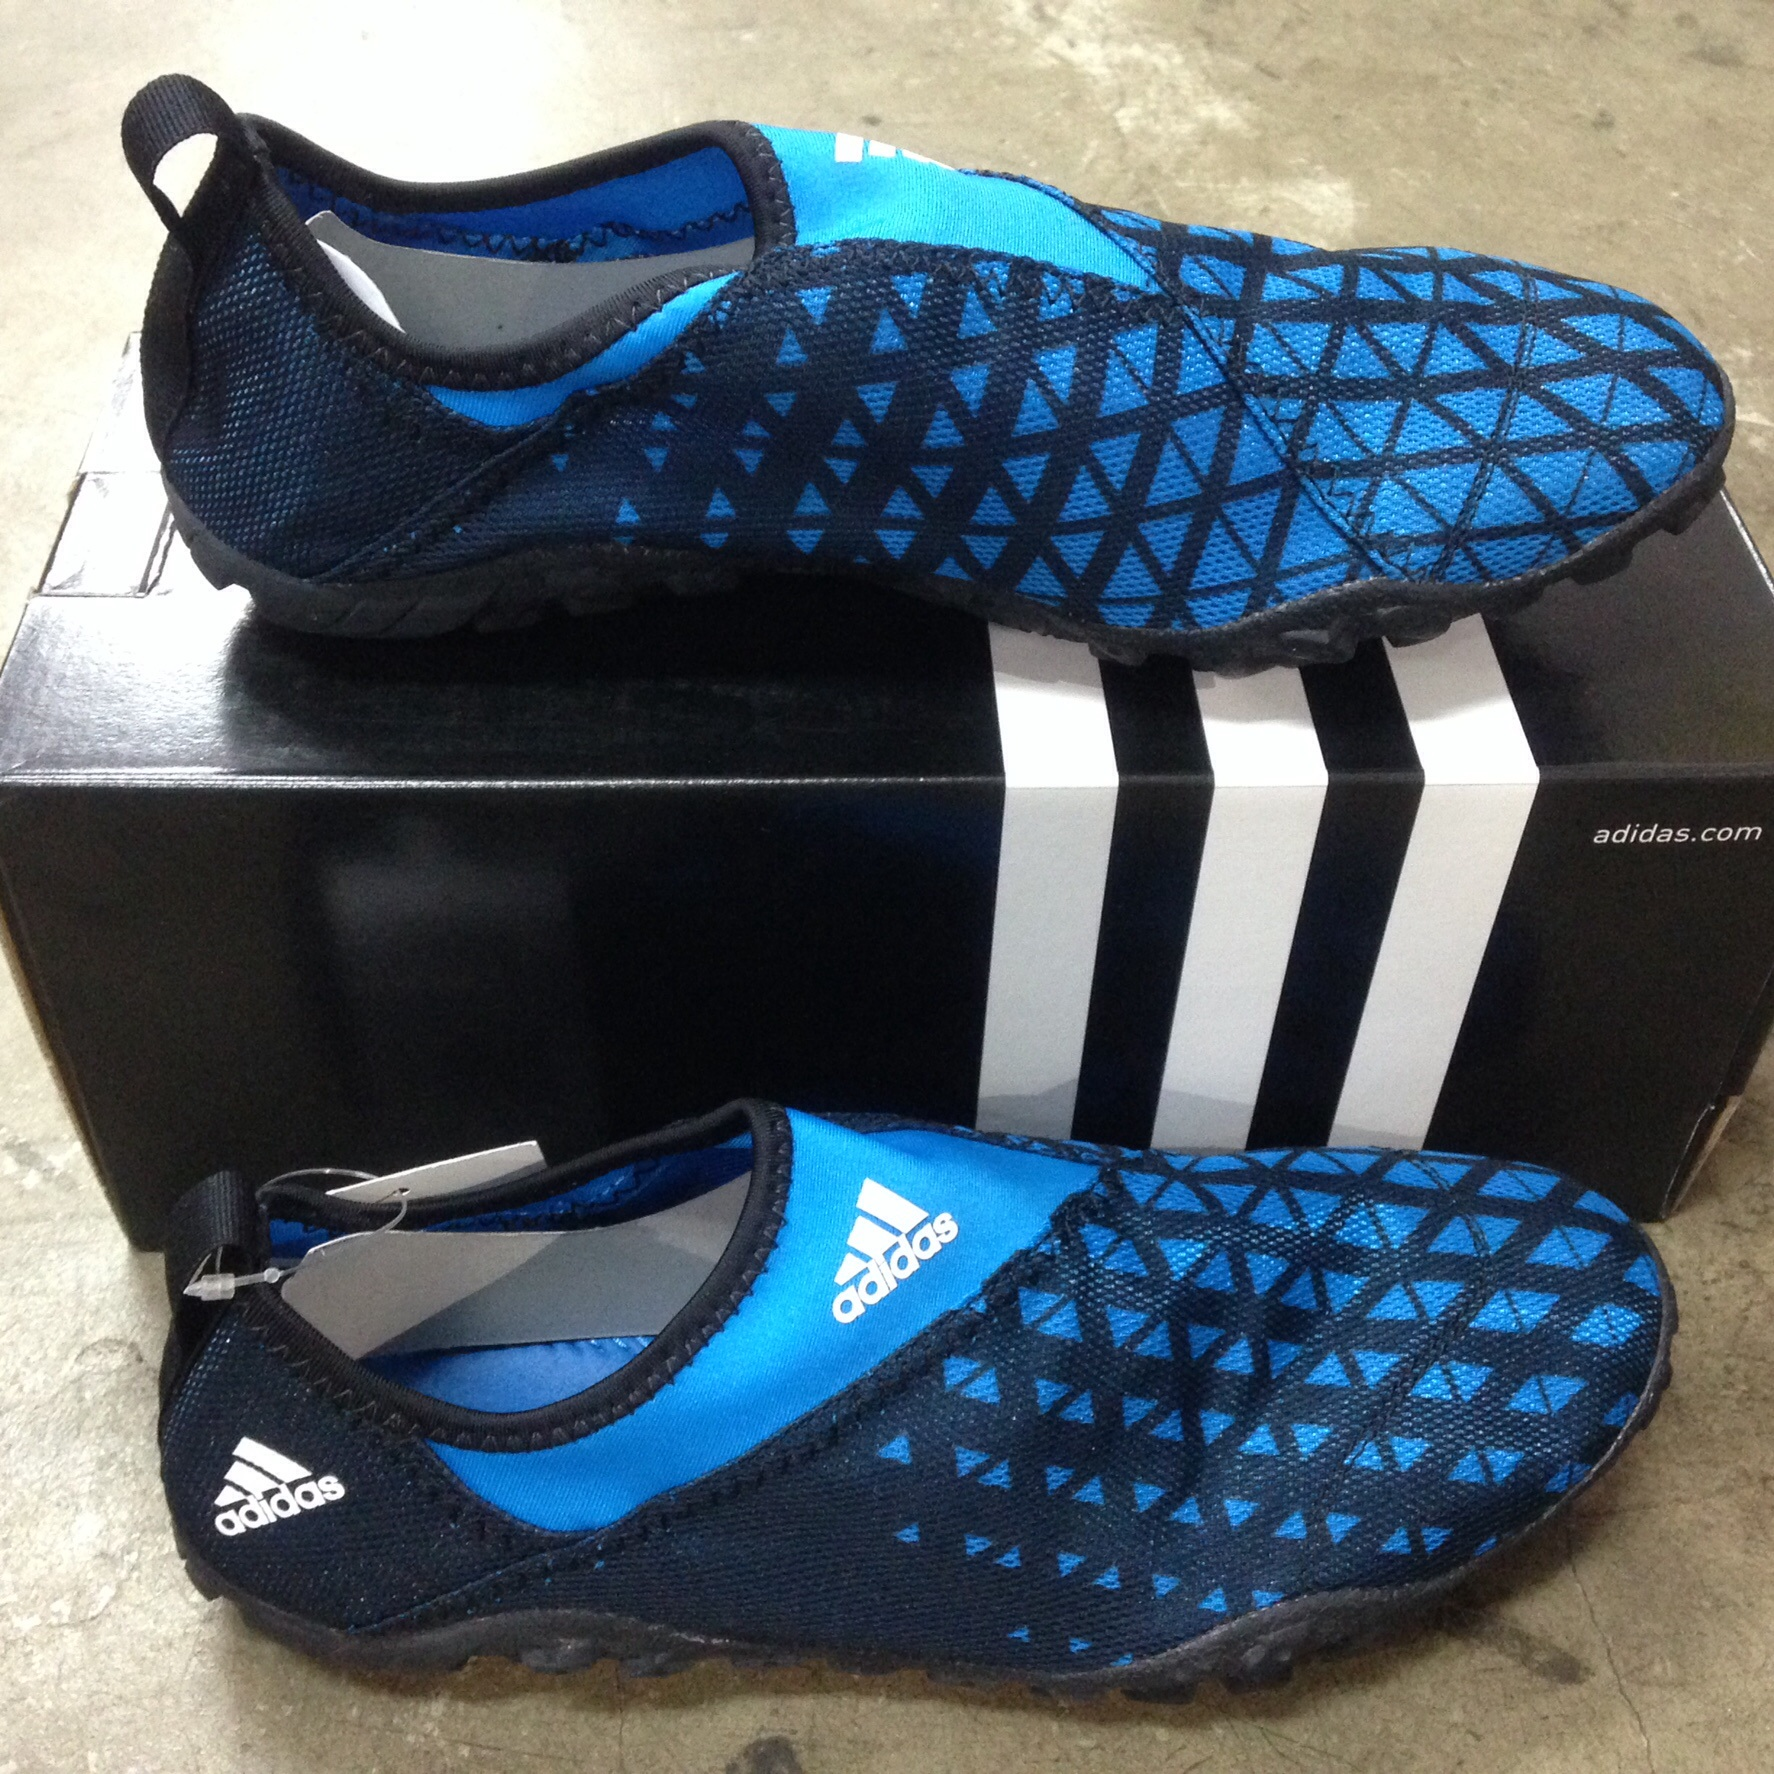 on sale fa390 e6fca Terjual Sepatu Outdoor Adidas AX Camo Jawpaw Sports Hiker dll ALL ORIGINAL